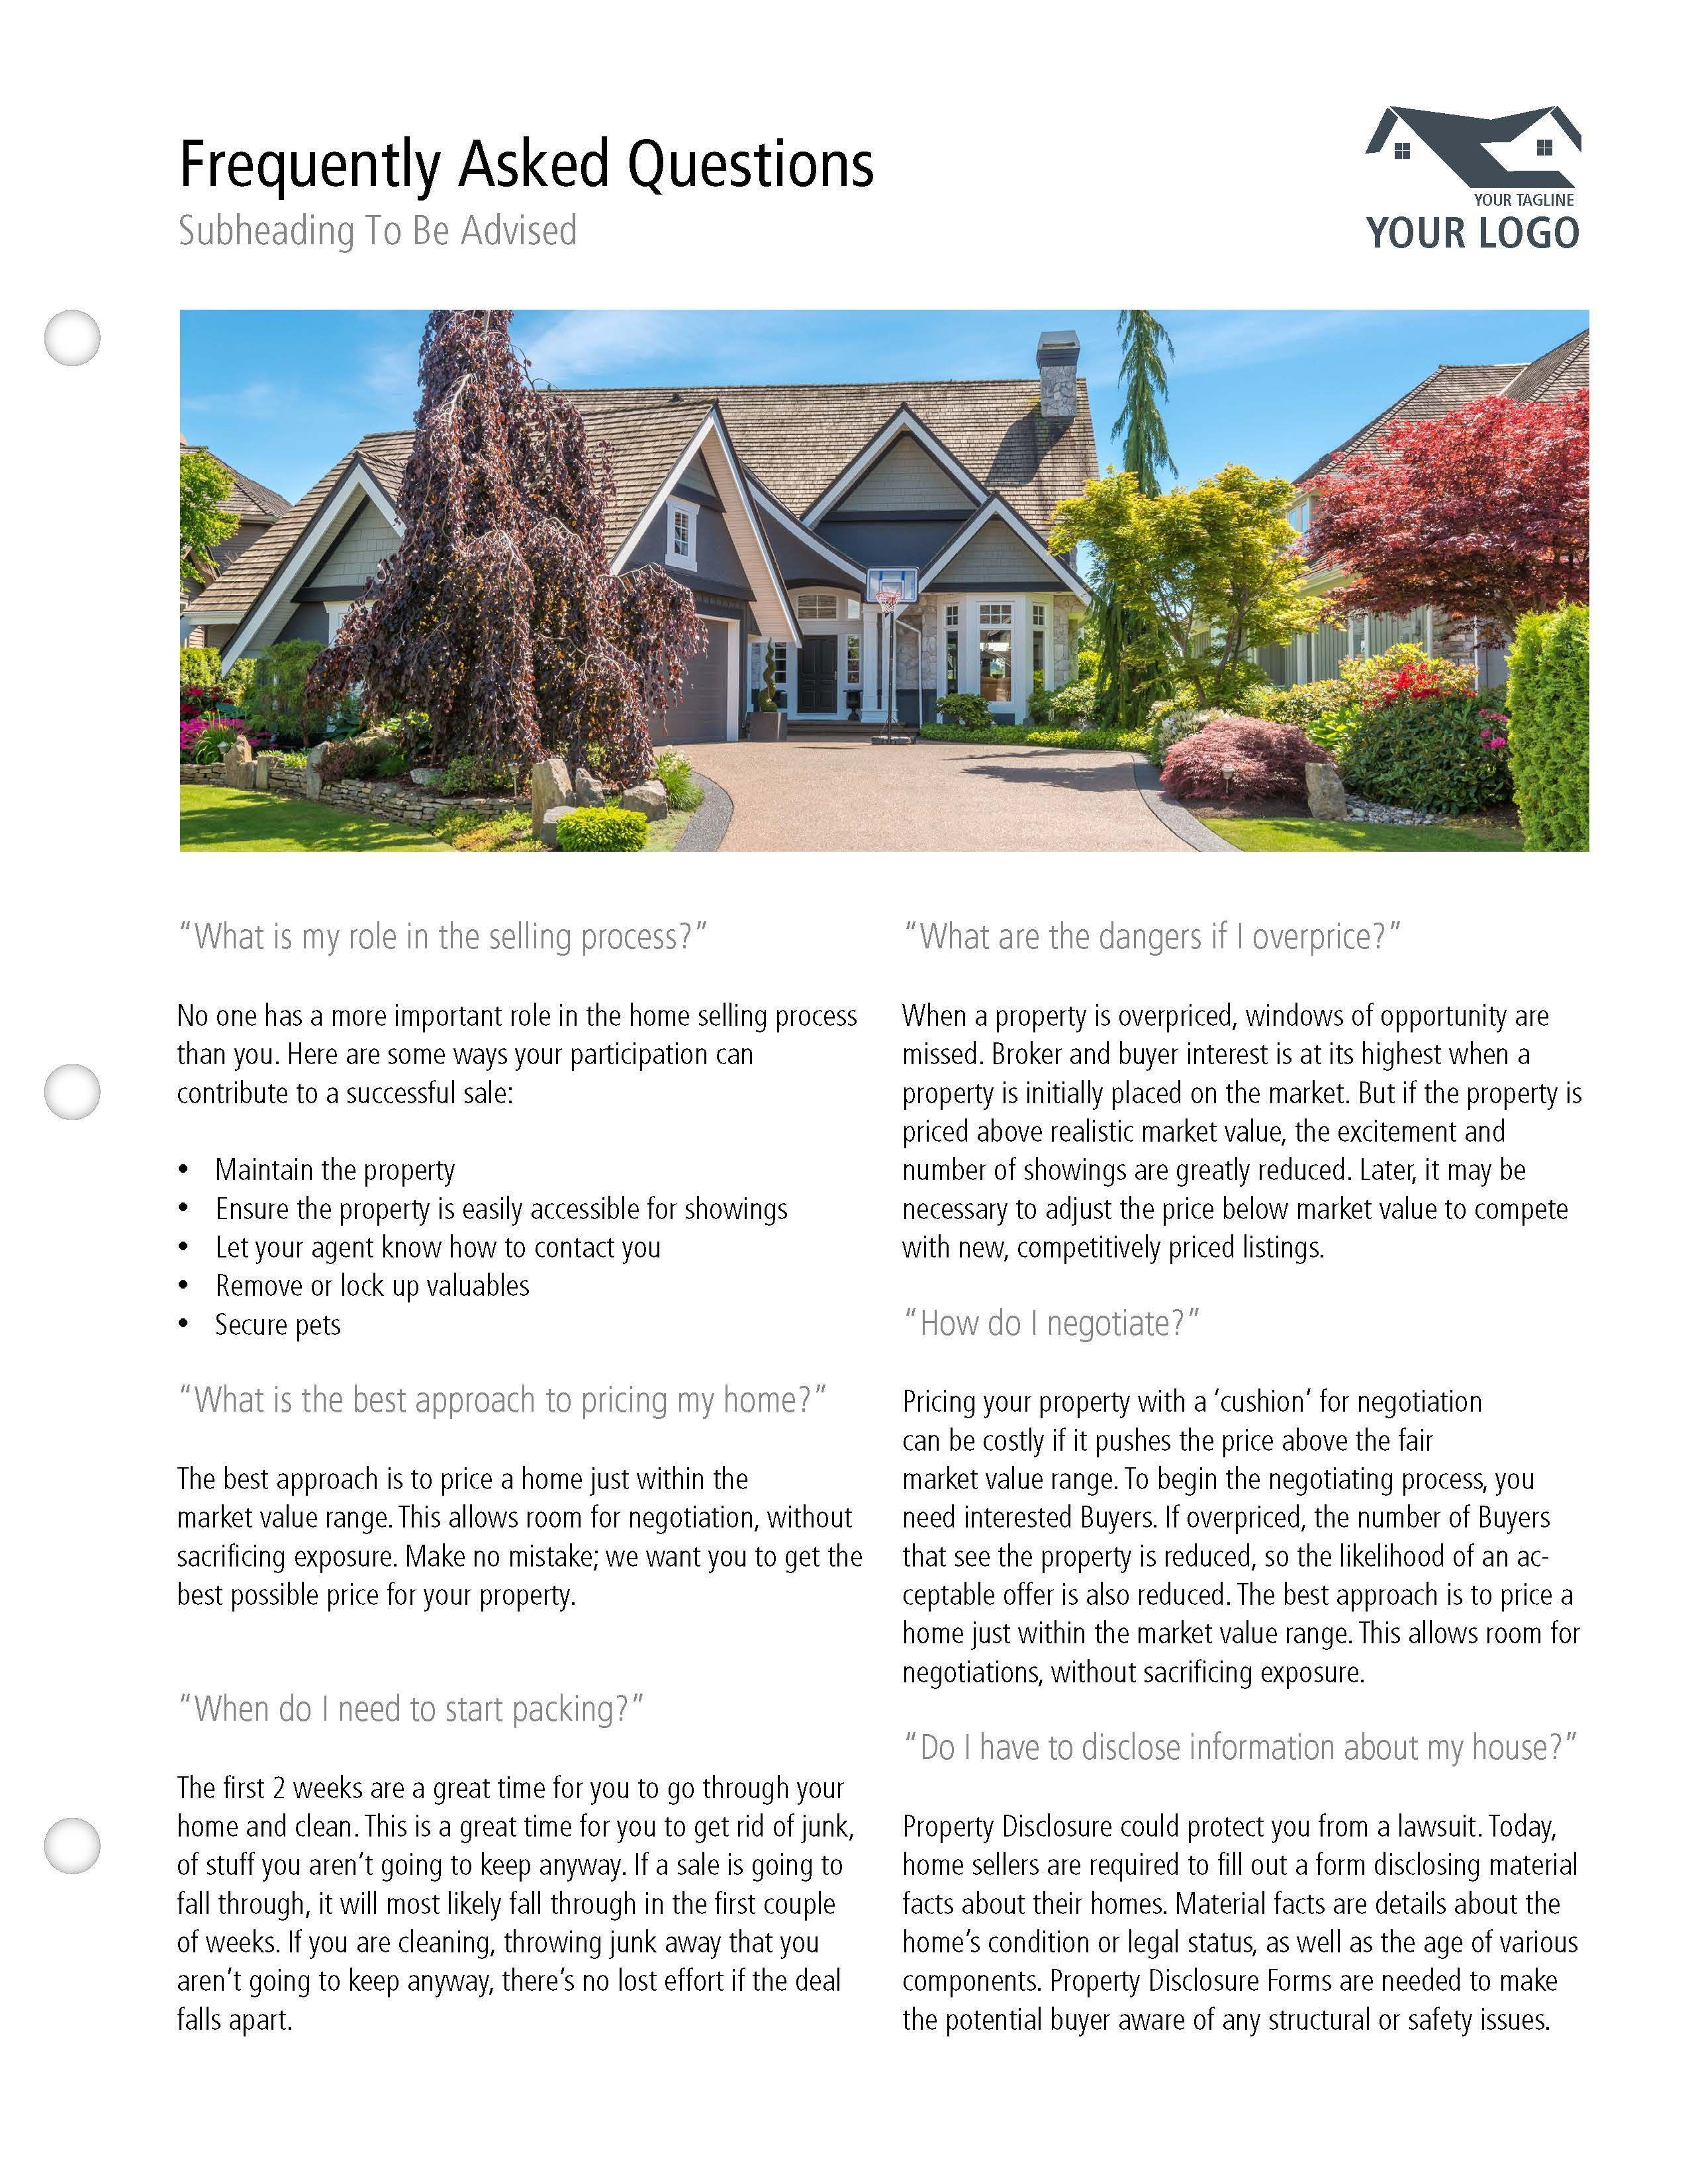 Realtor Listing Presentation Templatelimelight Marketing Pertaining To Real Estate Listing Presentation Template